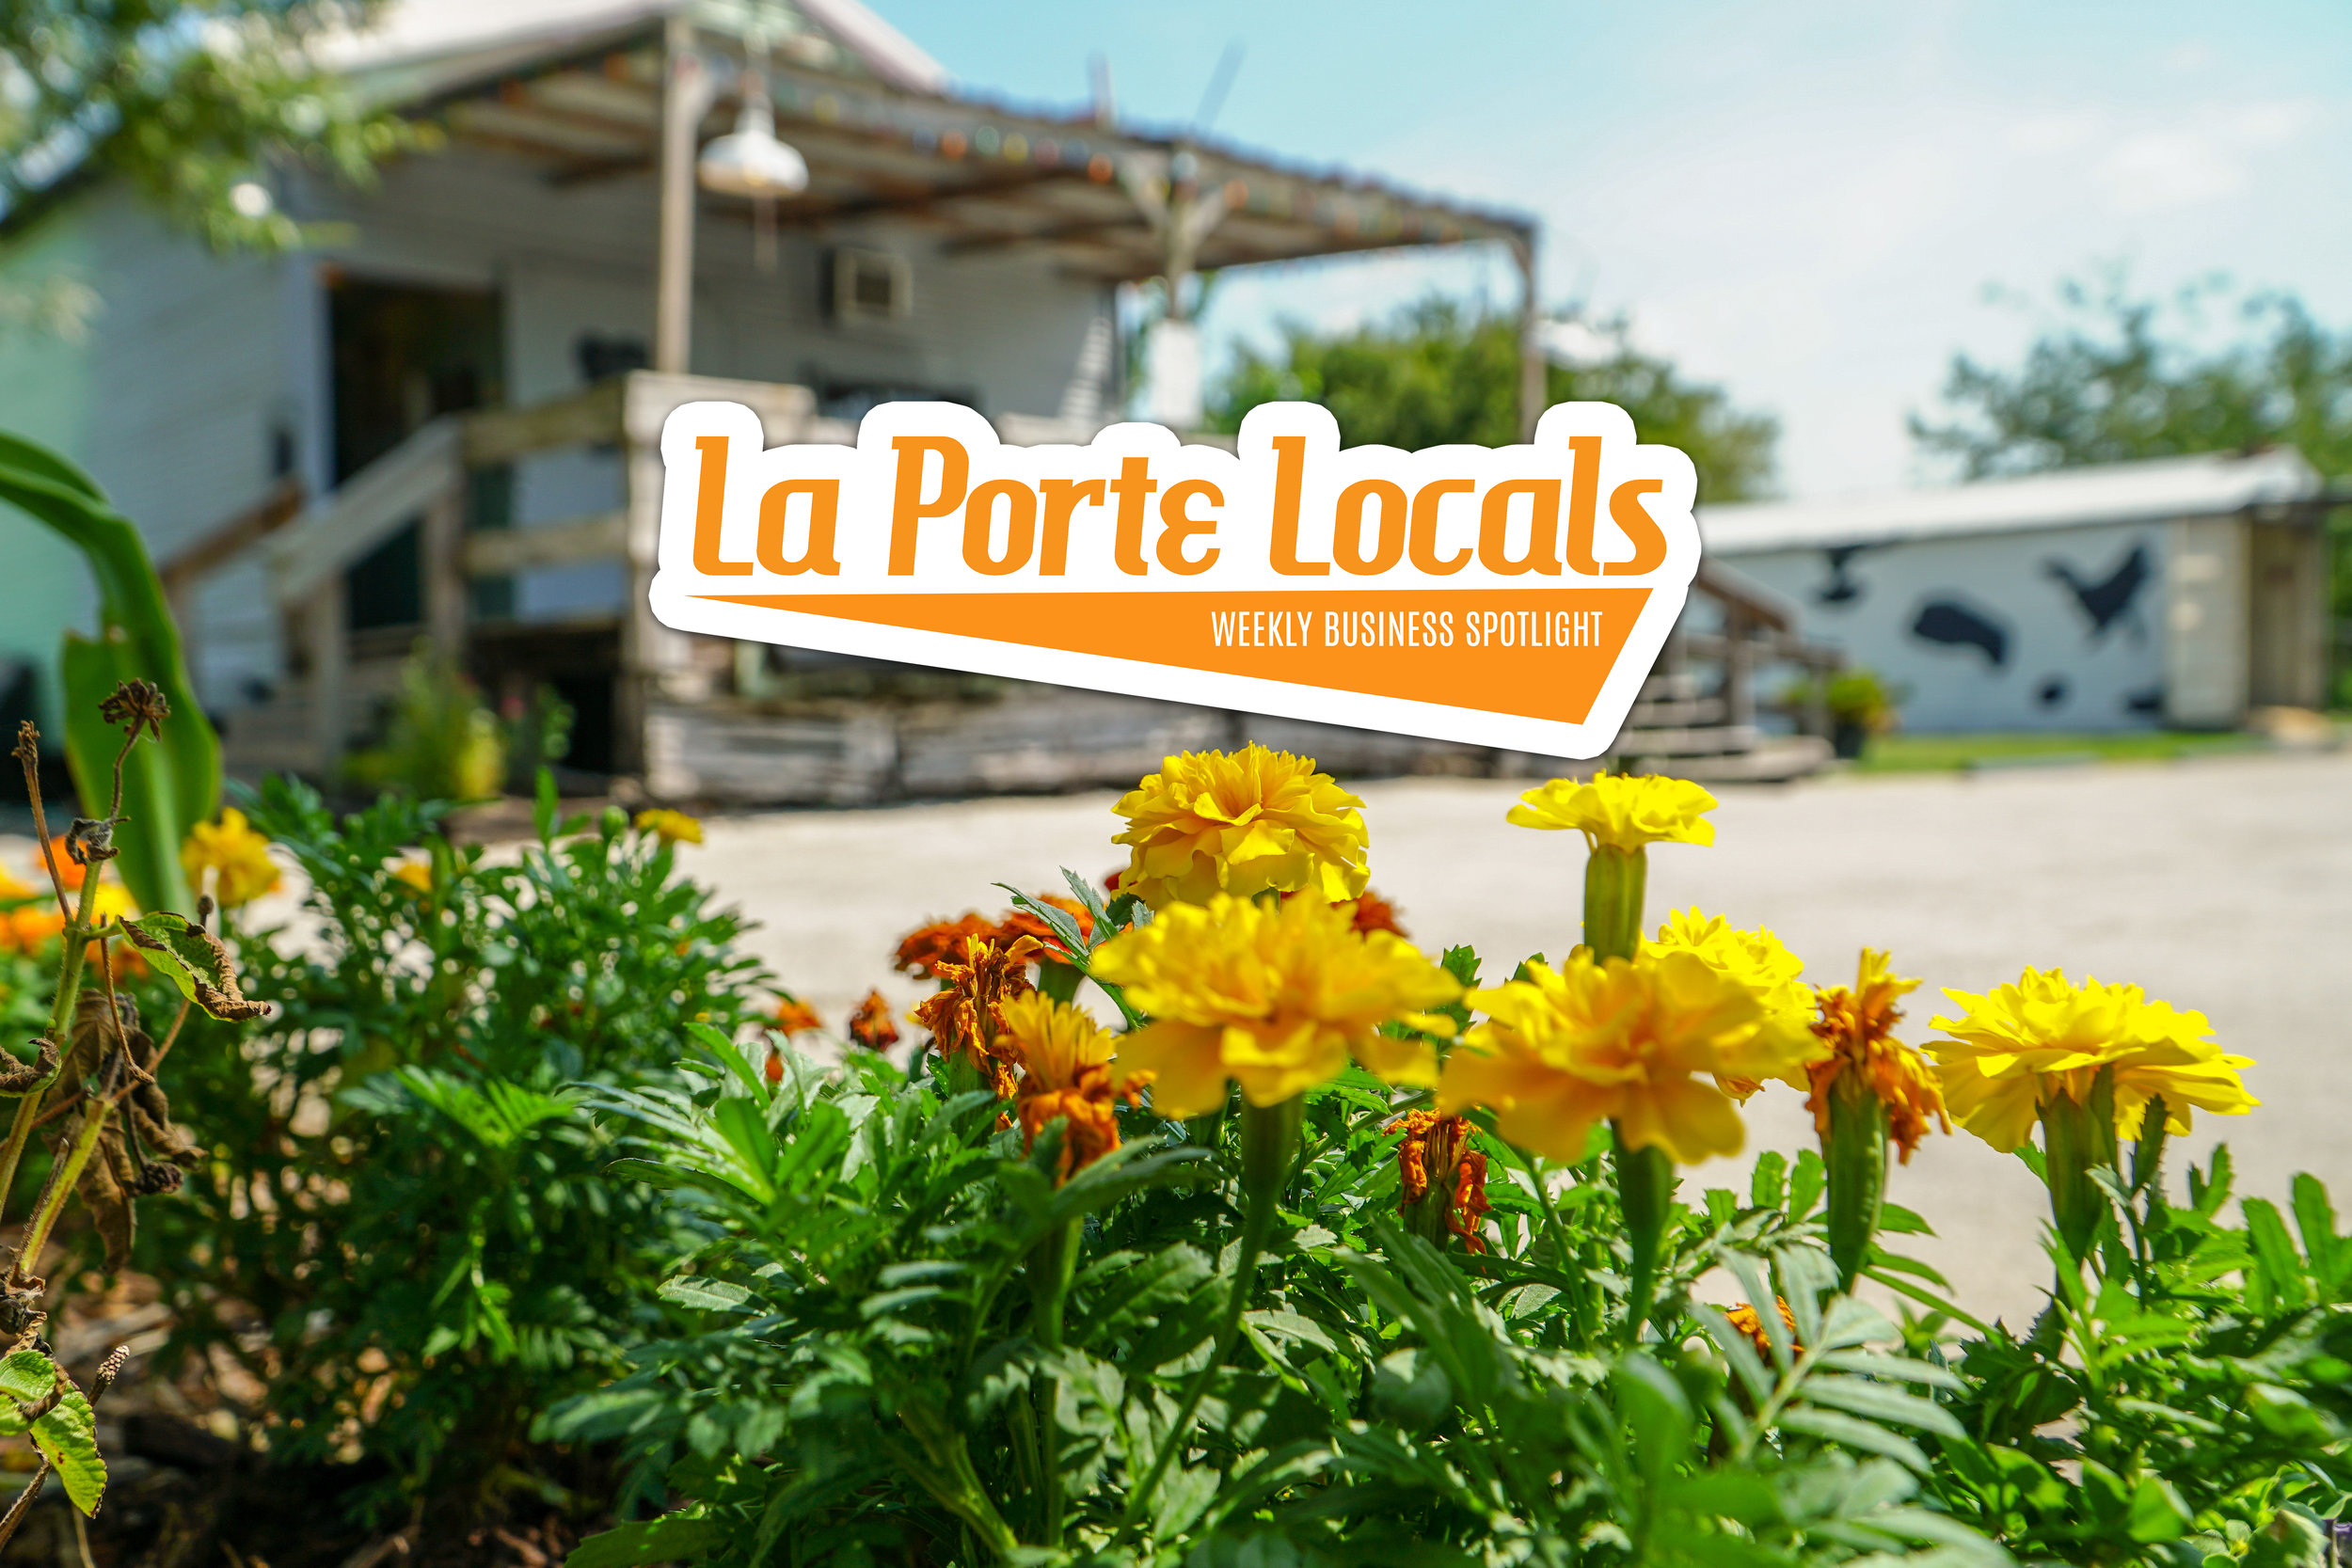 La Porte Feed and Supply